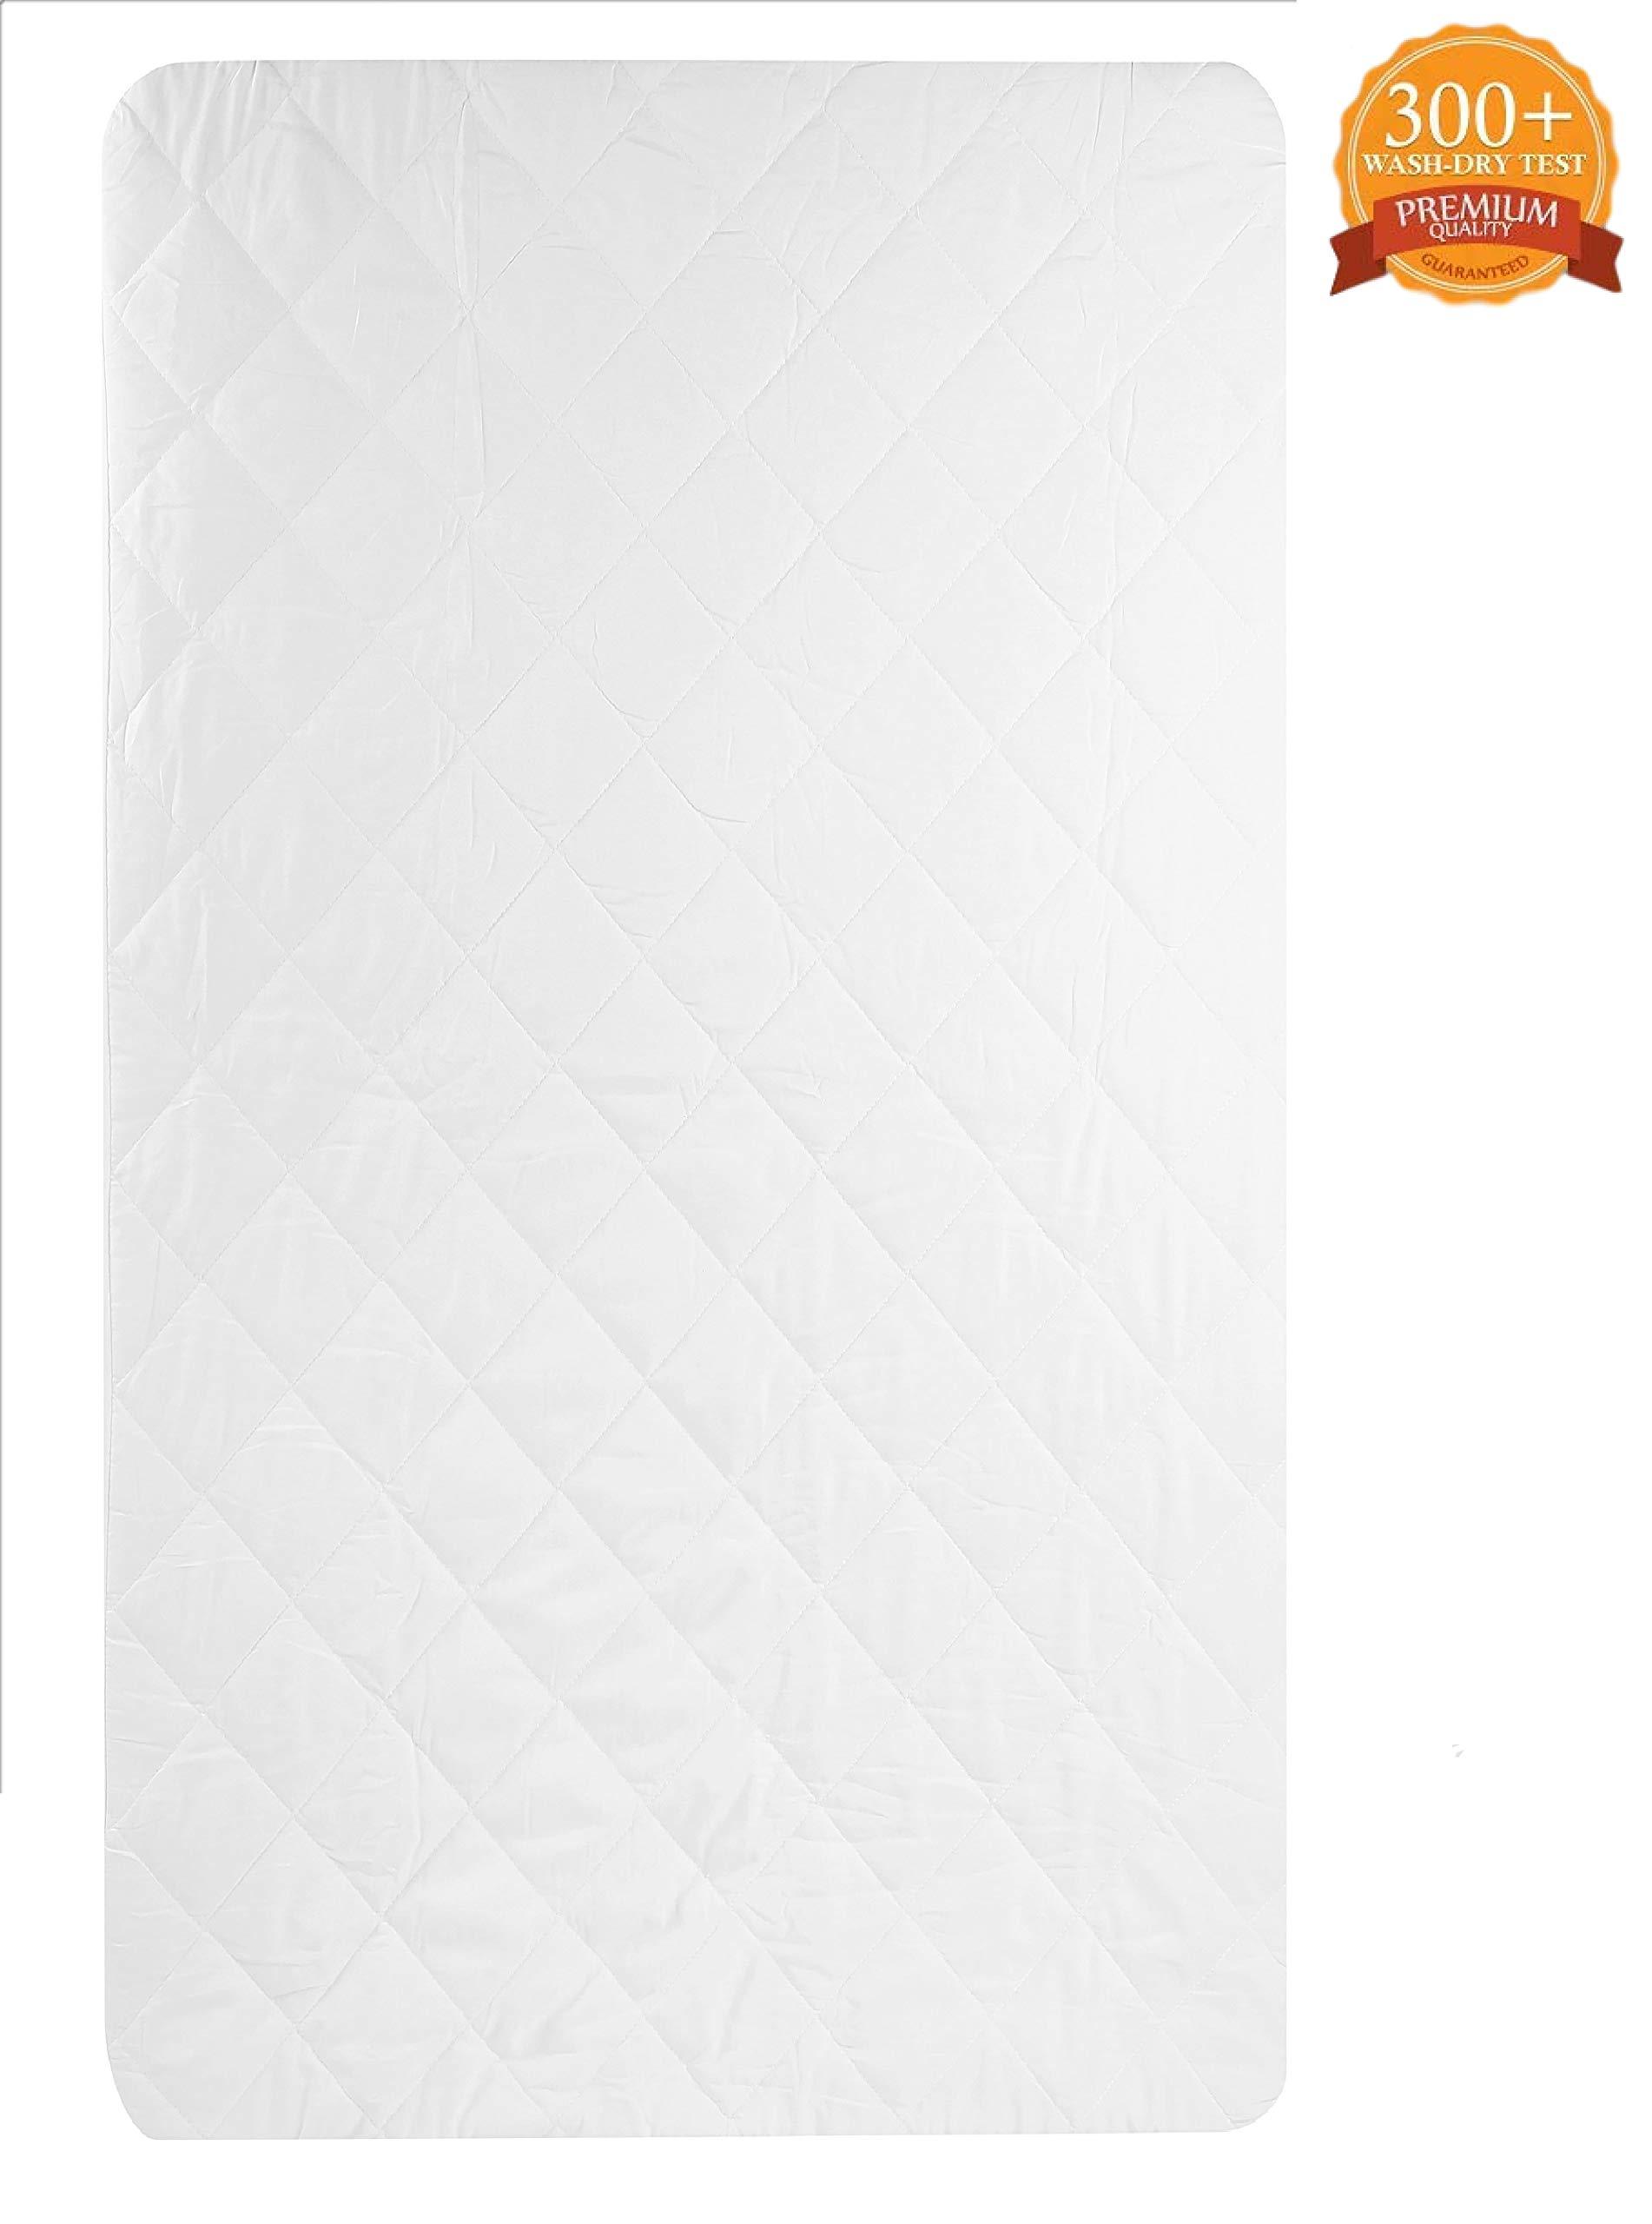 Waterproof Crib Mattress Pad - Fitted Baby Crib Mattress Pad, Hypoallergenic, Absorbent - 28'' x 52'' x 9'' - Classic White